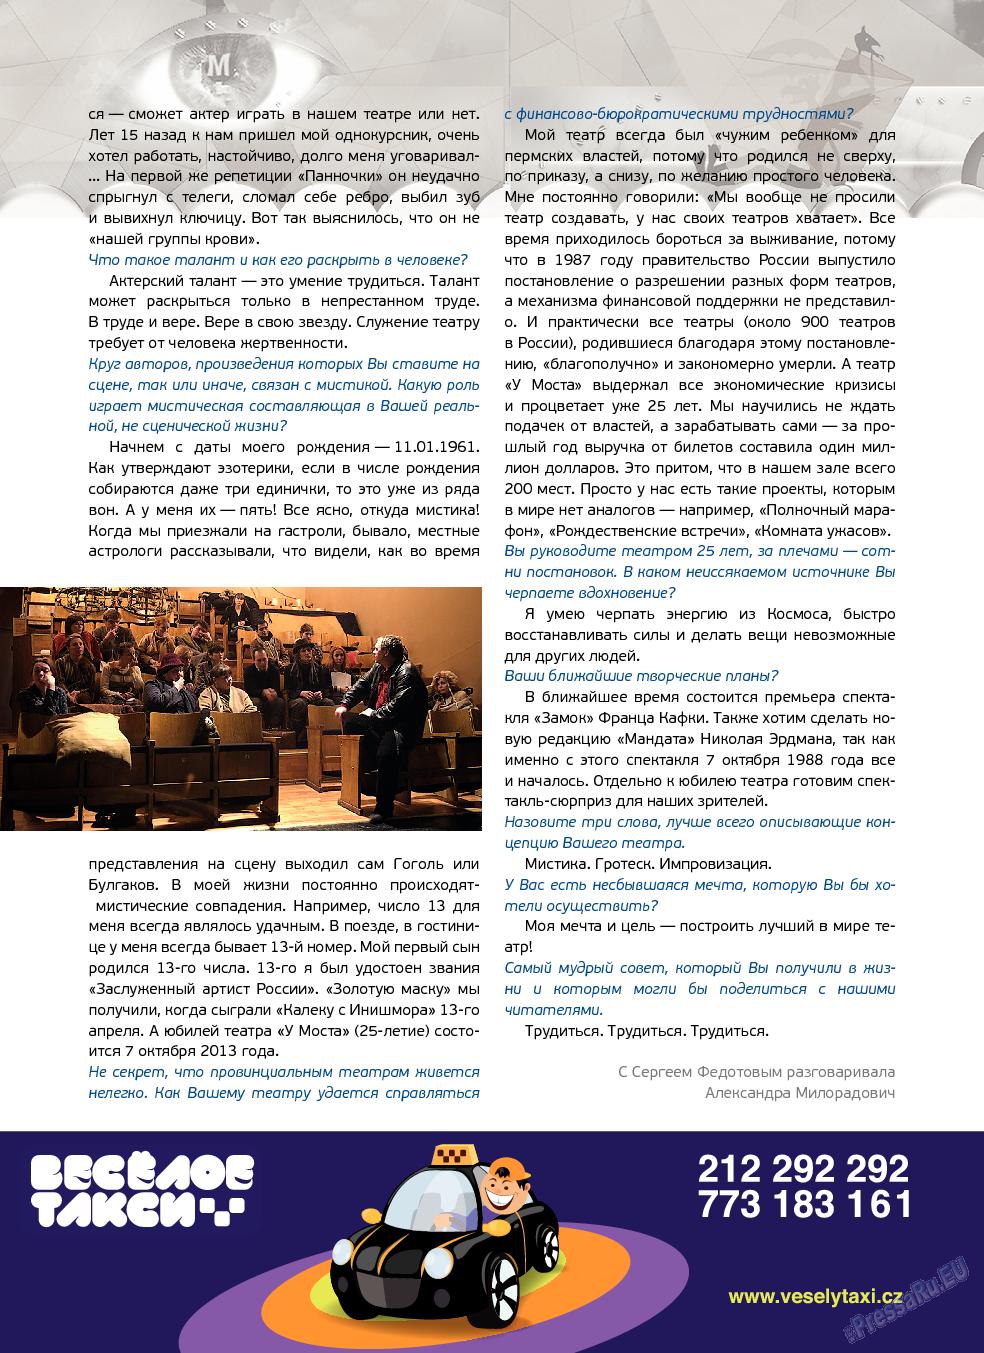 Артек (журнал). 2013 год, номер 2, стр. 27